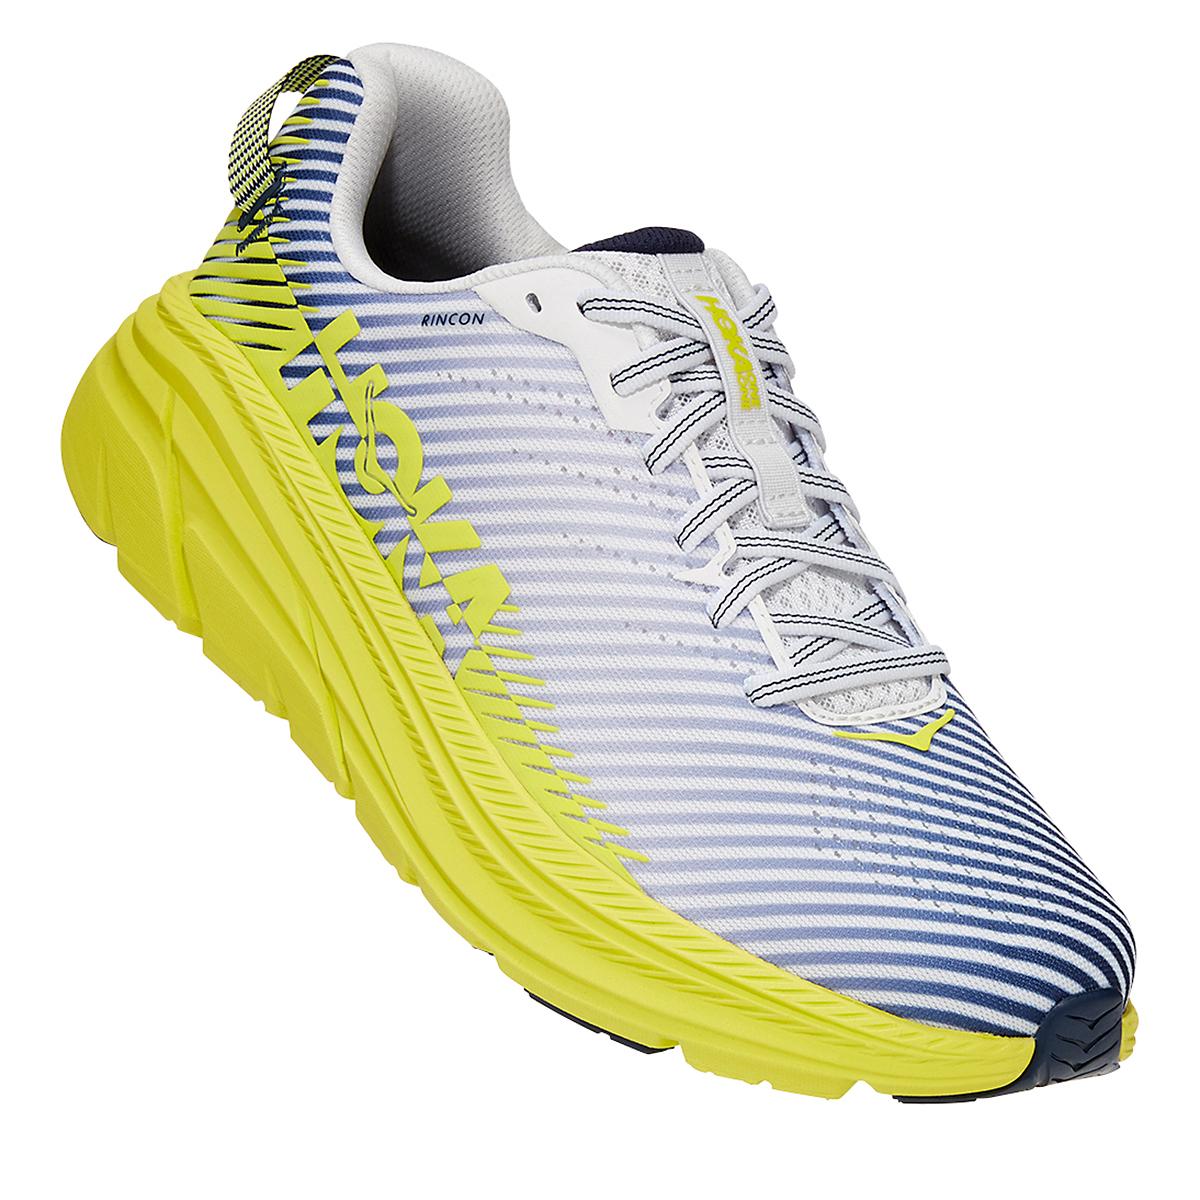 Men's Hoka One One Rincon 2 Running Shoe - Color: White/Yellow - Size: 7 - Width: Regular, White/Yellow, large, image 5